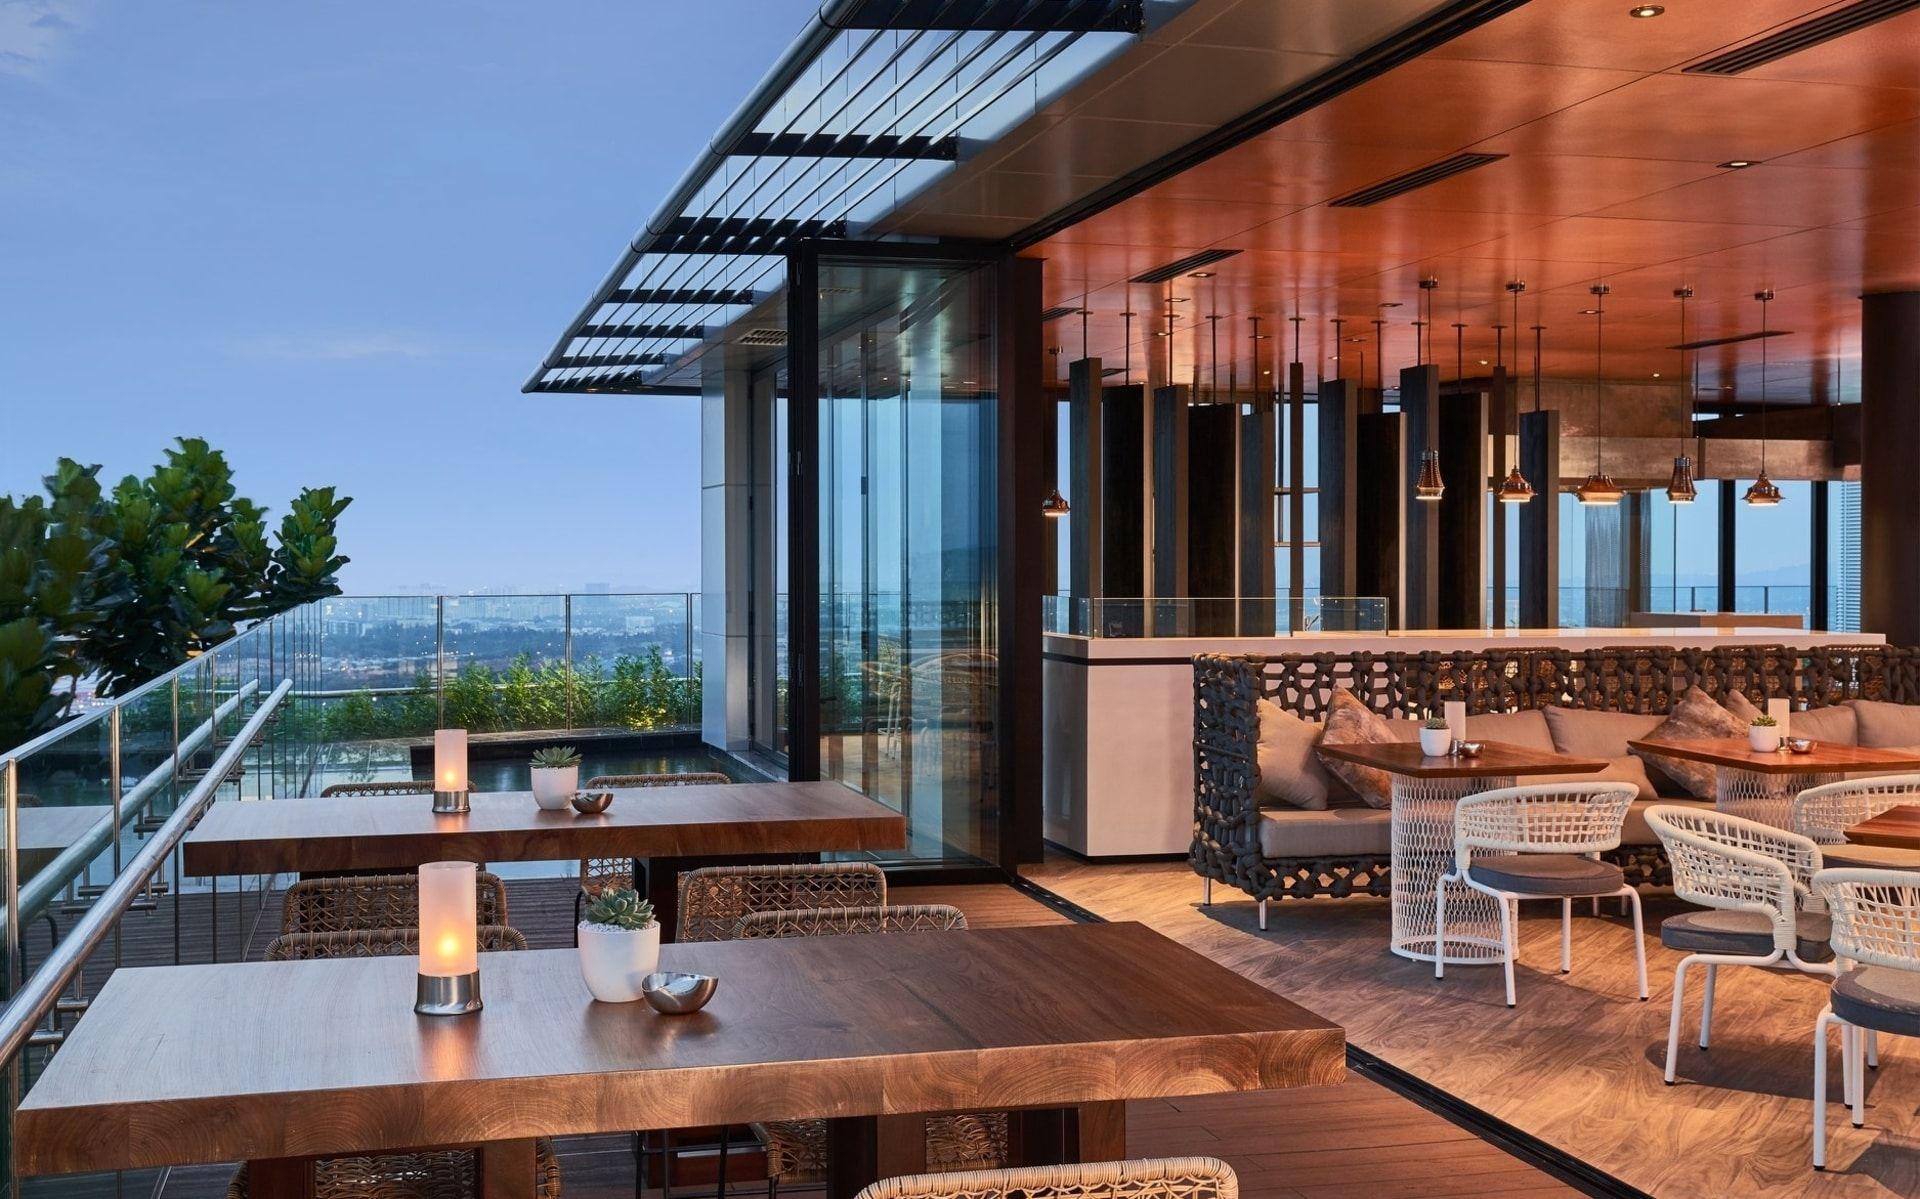 New World Petaling Jaya Hotel: 5 Things To Know About Kelana Jaya's First 5-Star Hotel